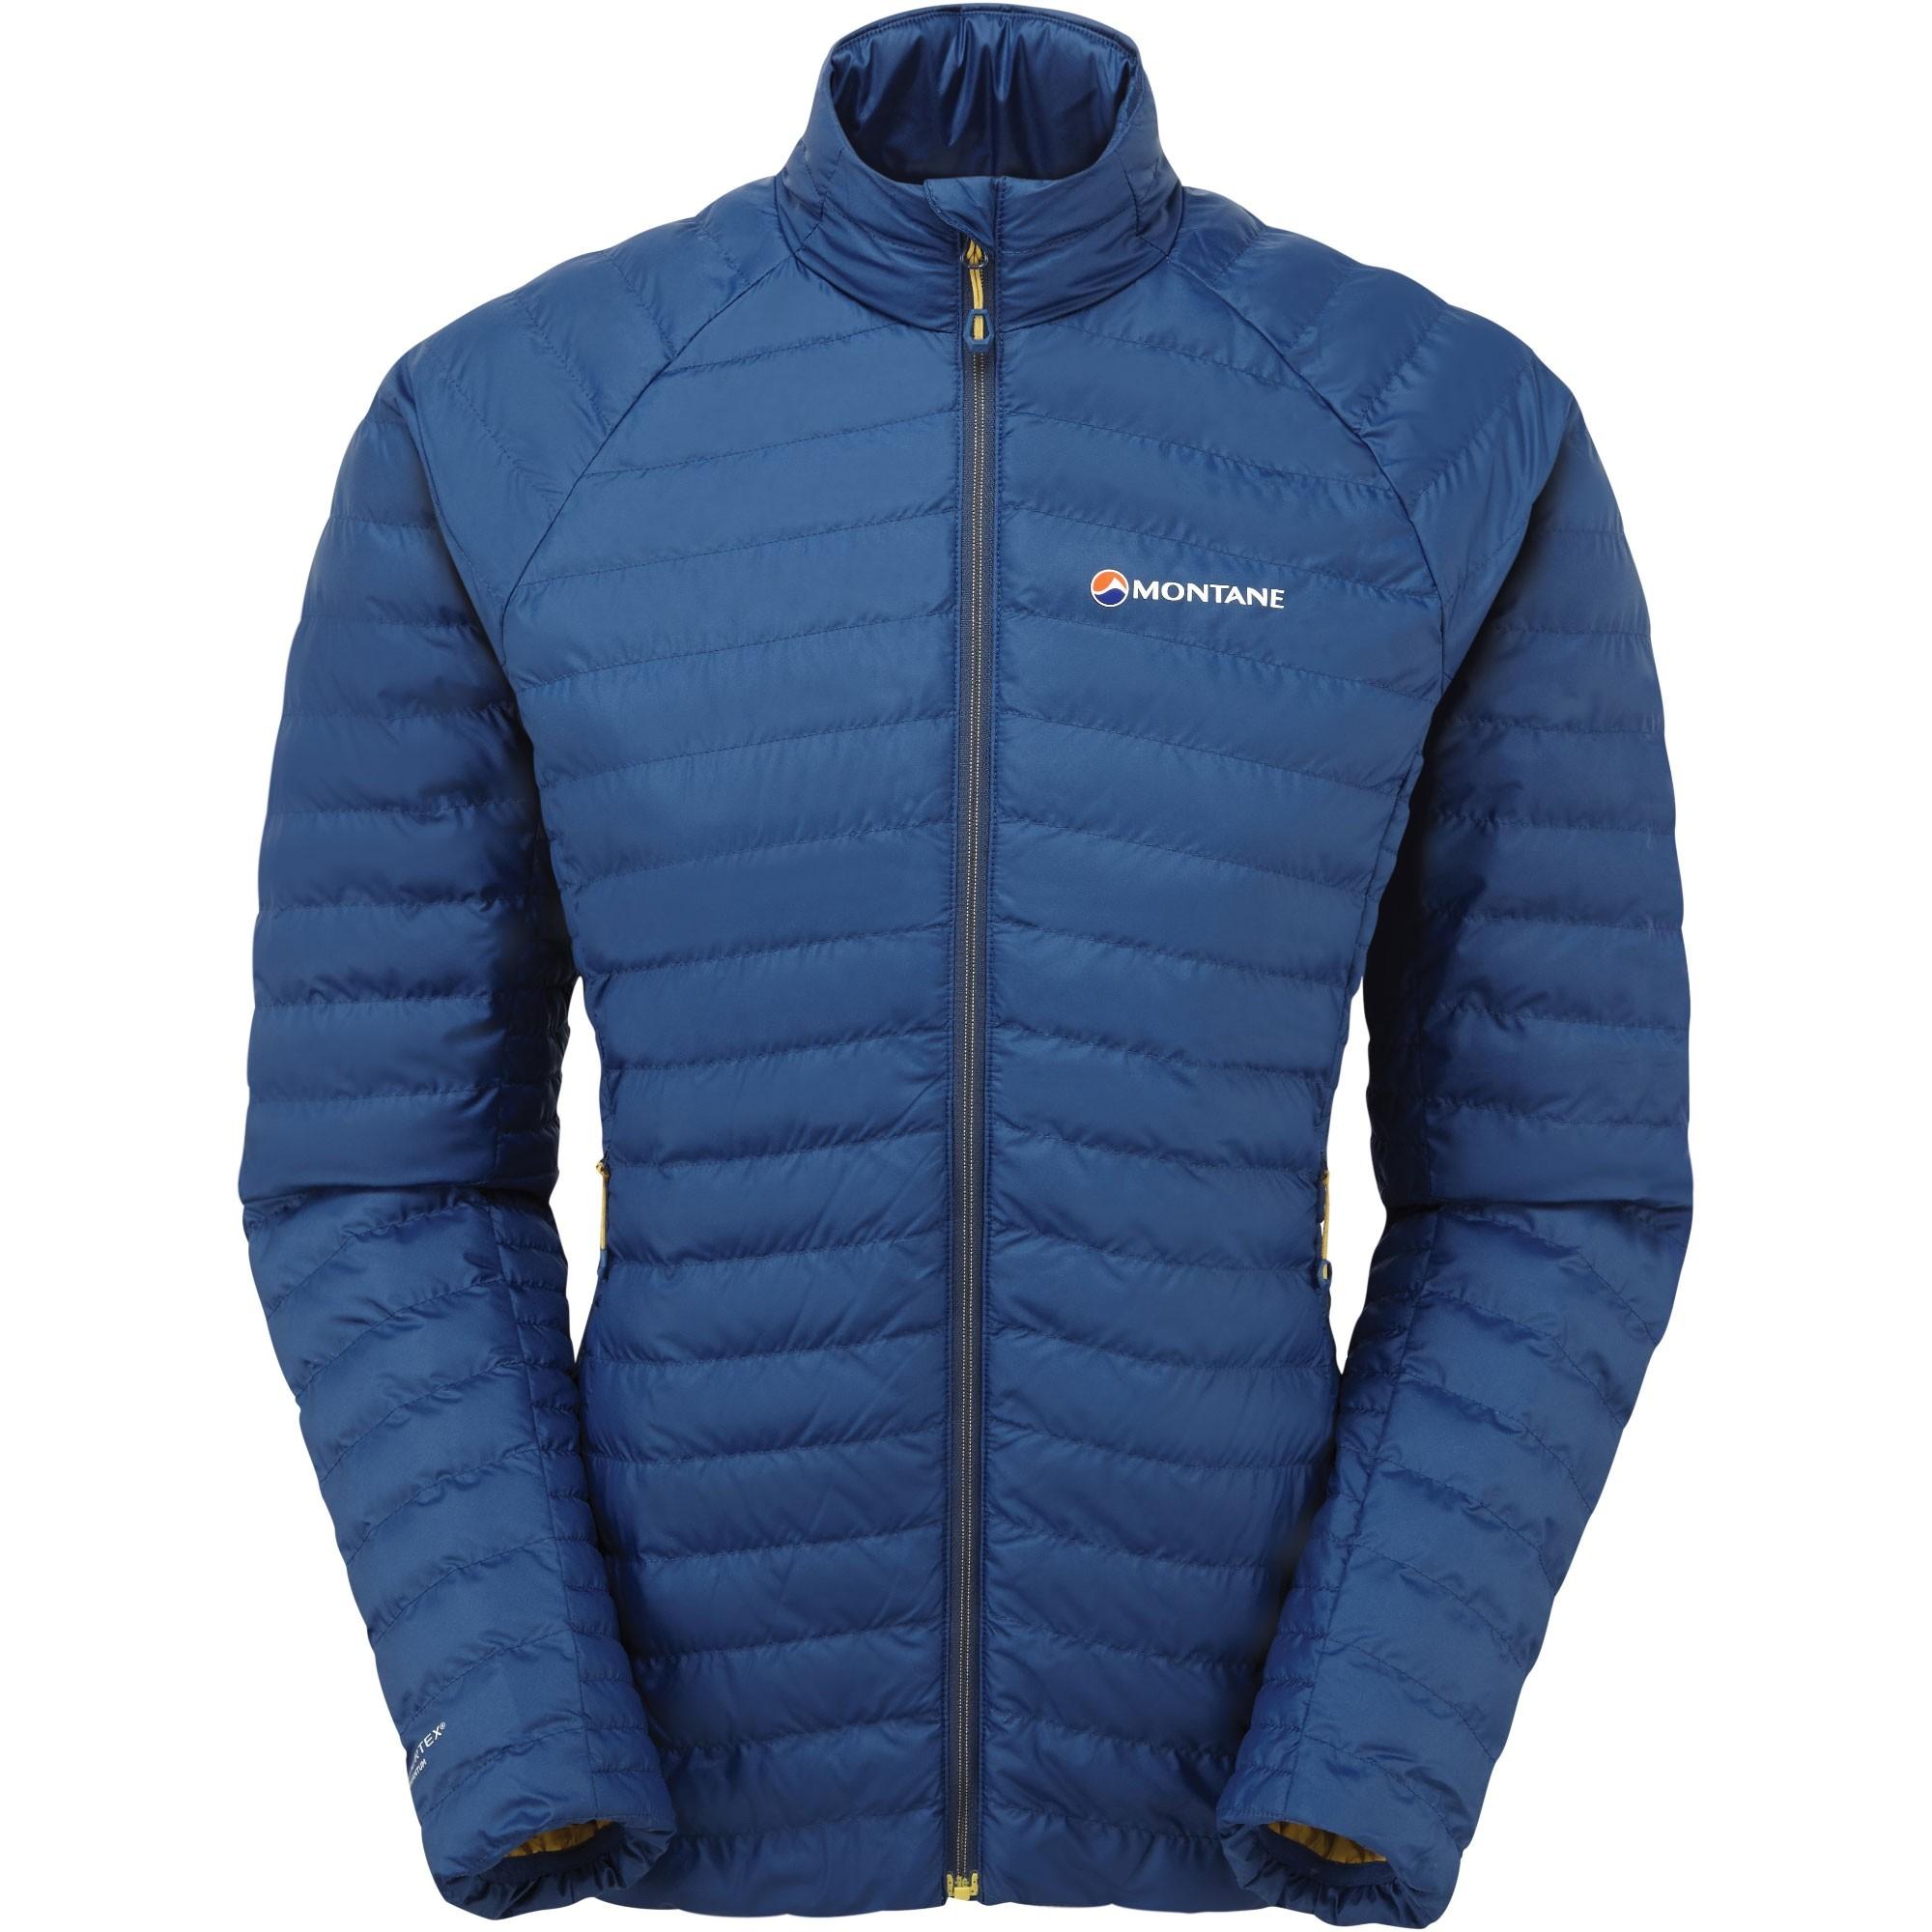 Montane Women's Phoenix Micro Jacket - Narwhal Blue